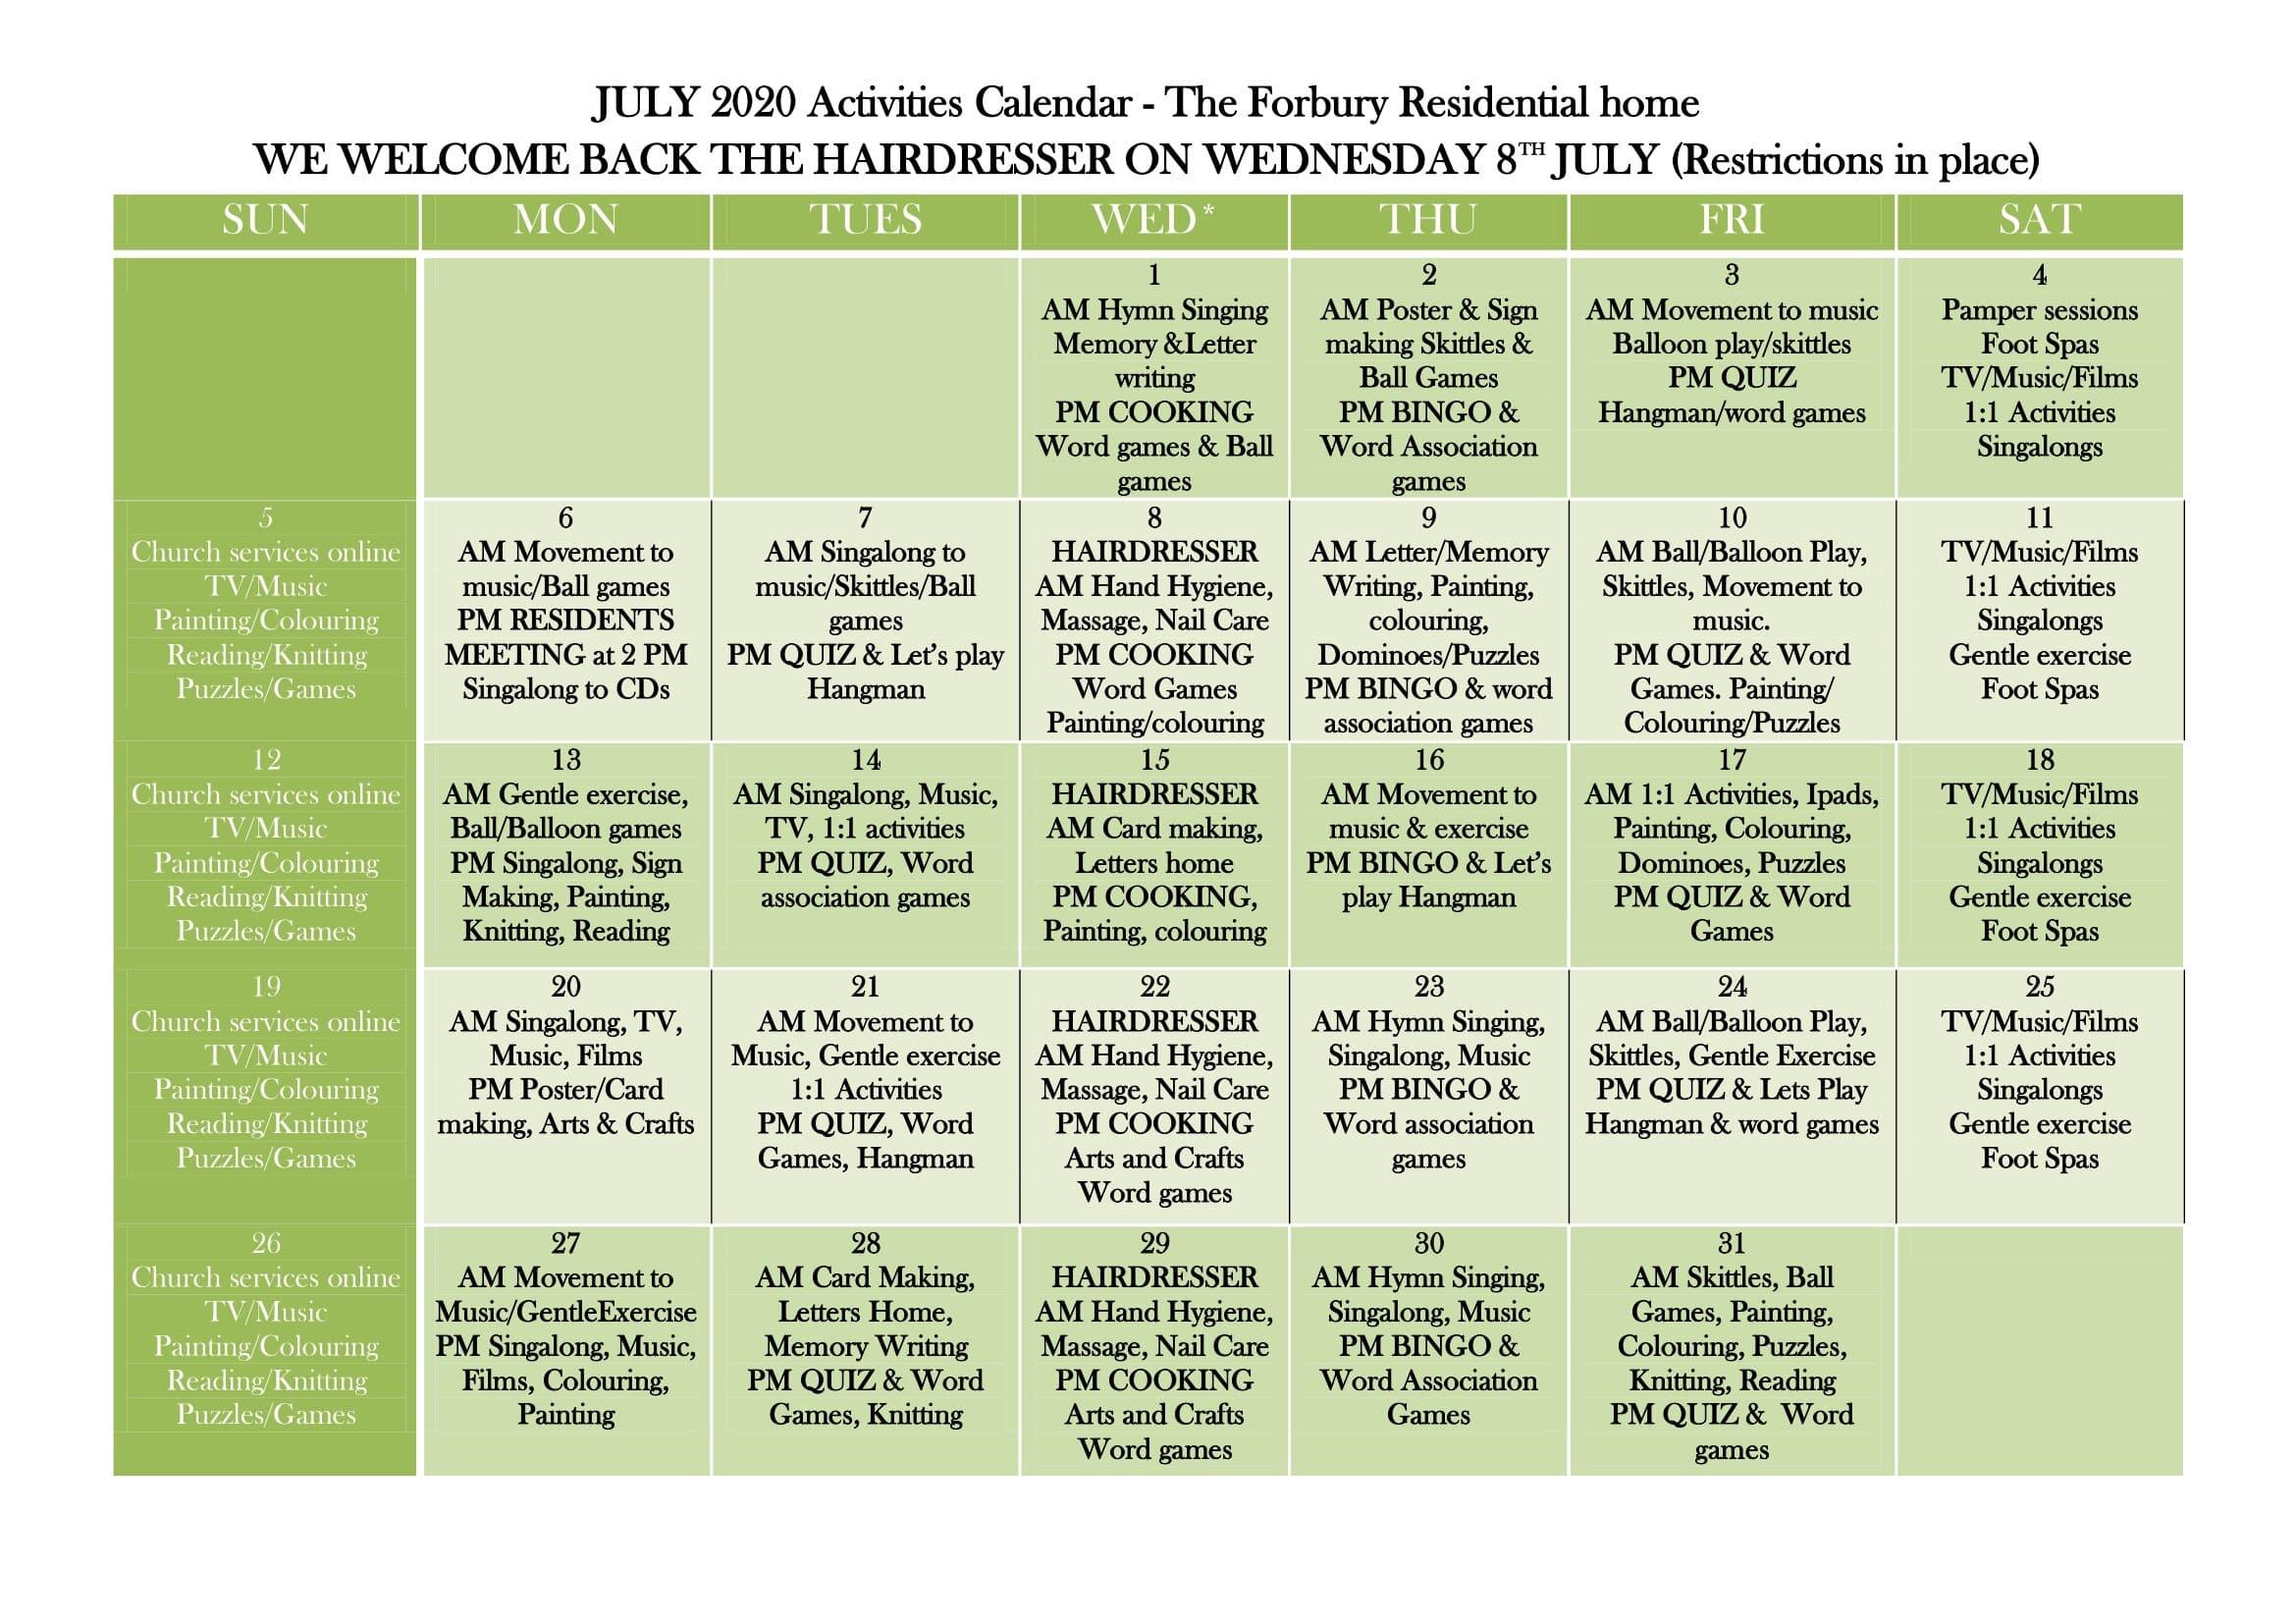 JULY 2020 MONTH ACTIVITY CALANDER (1)